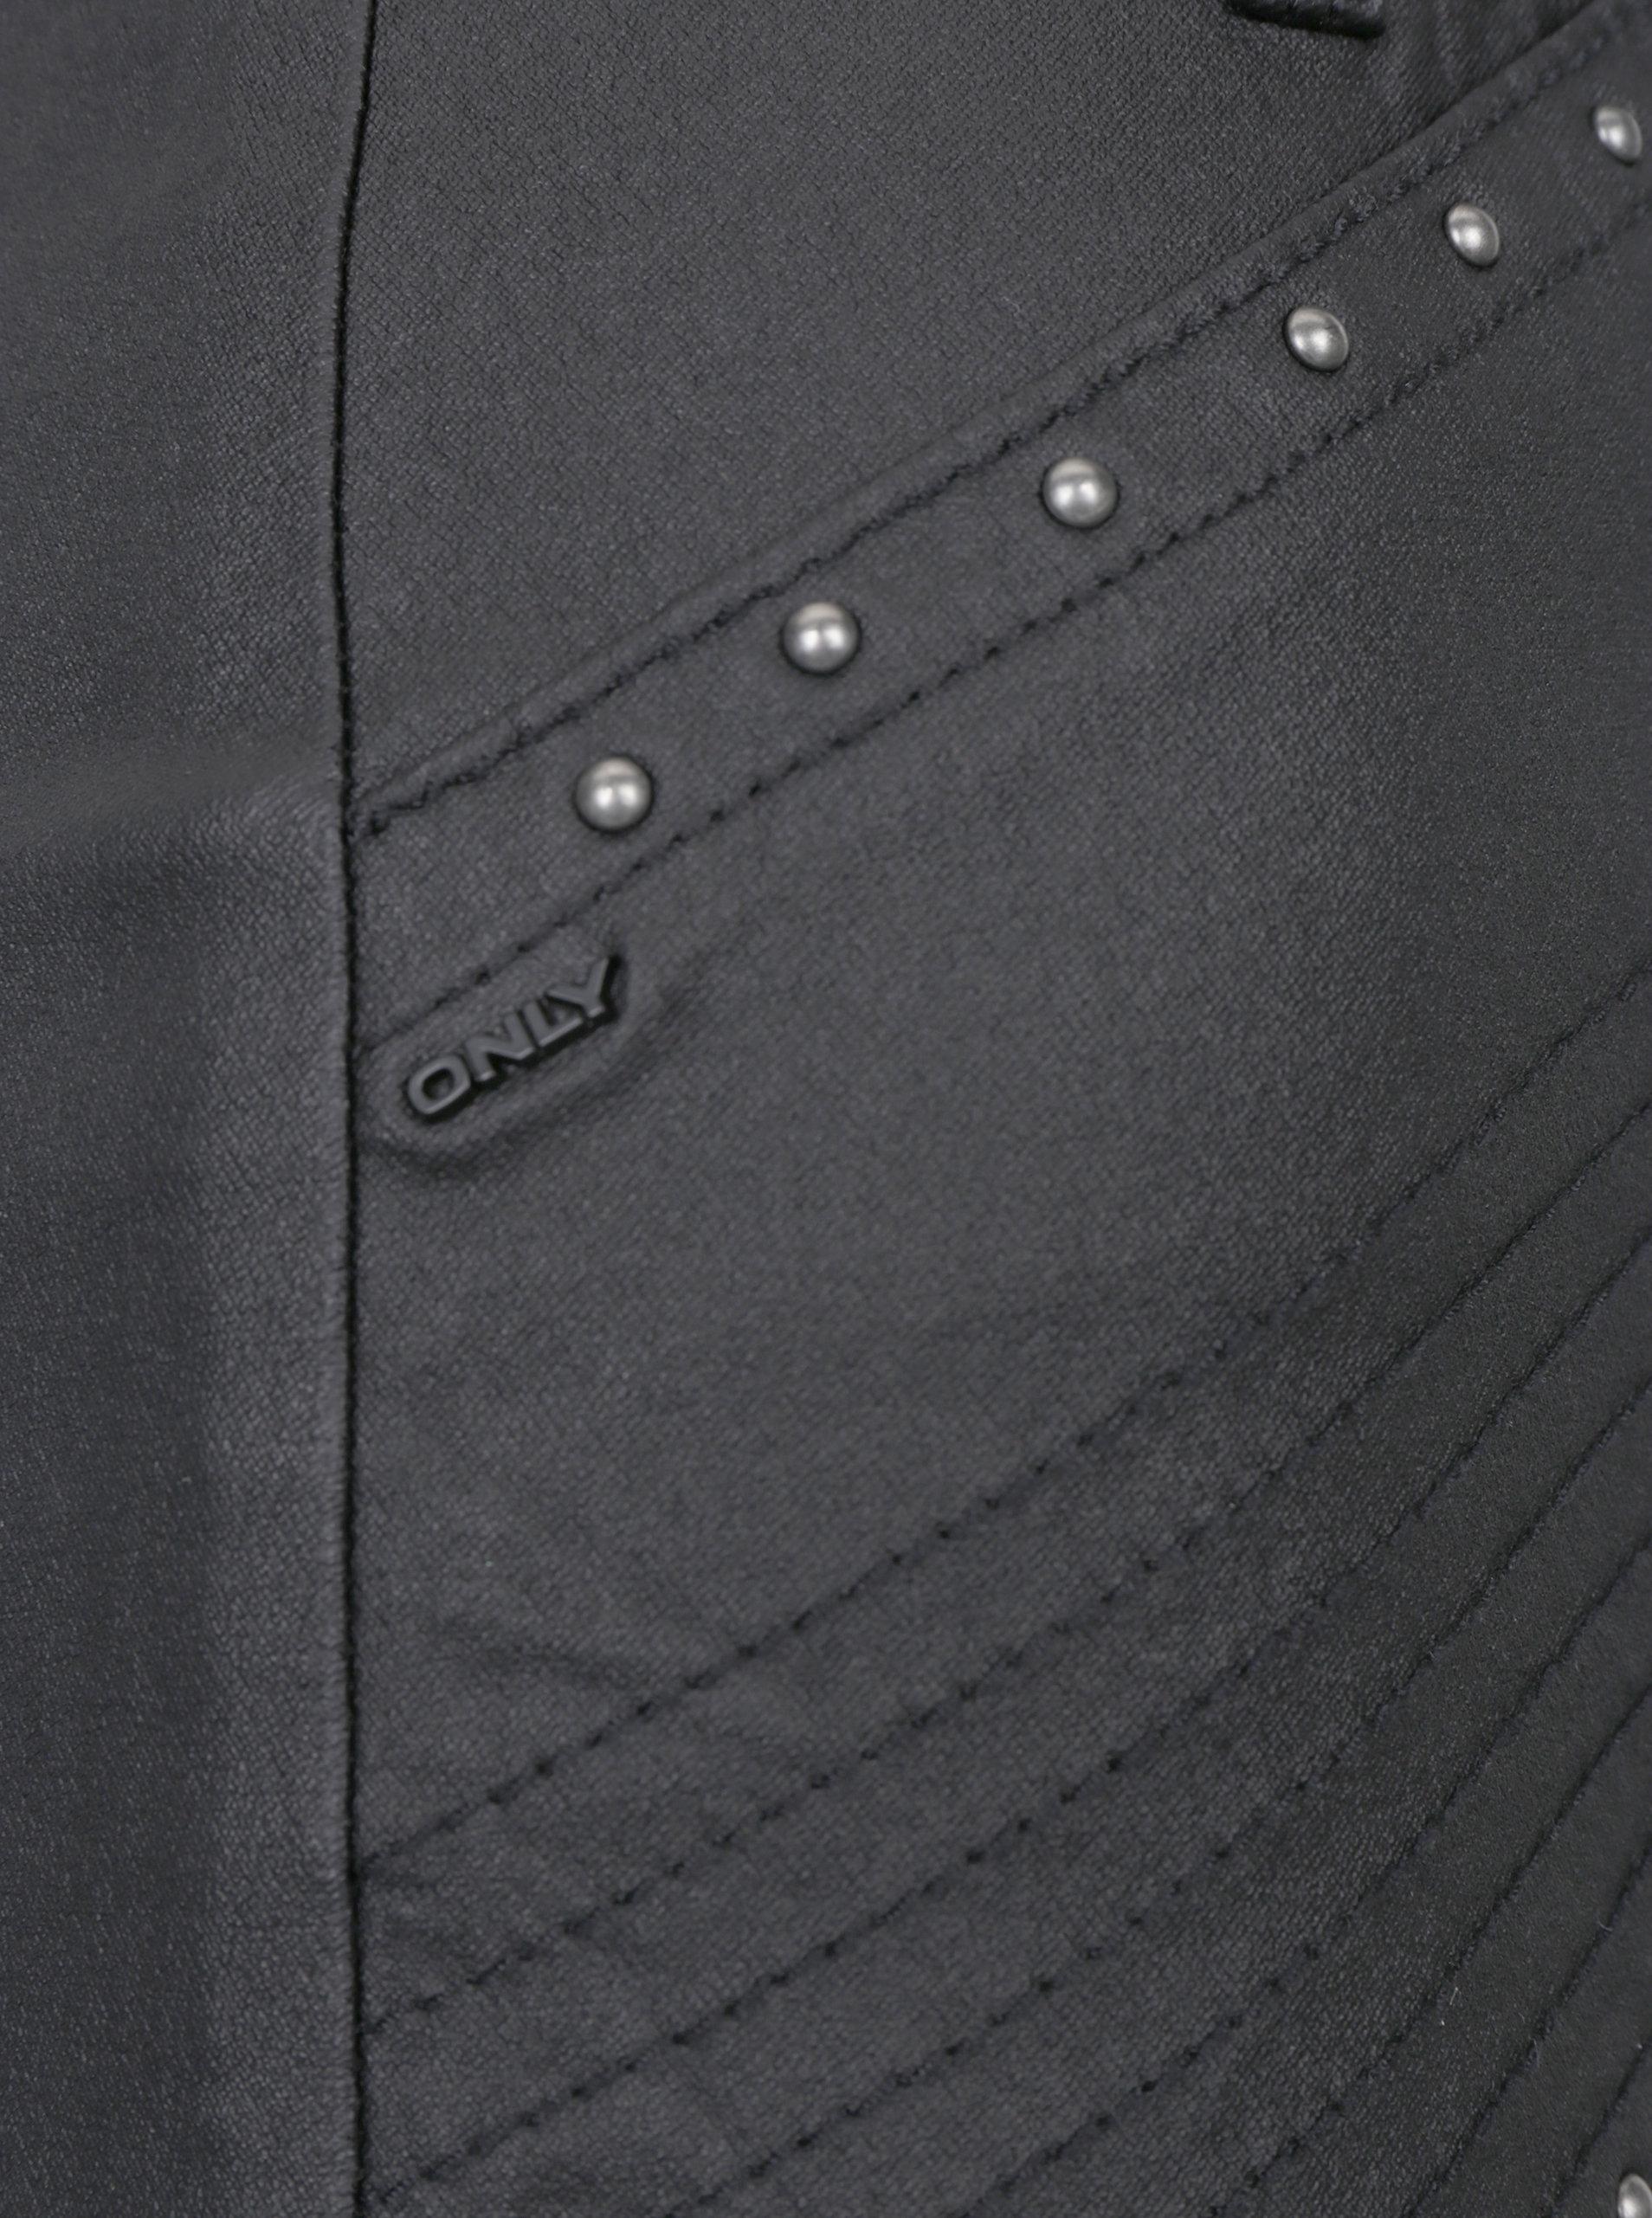 3fde5586fa0c Čierna koženková sukňa s ozdobnými plastickými detailmi ONLY Tough Rock ...